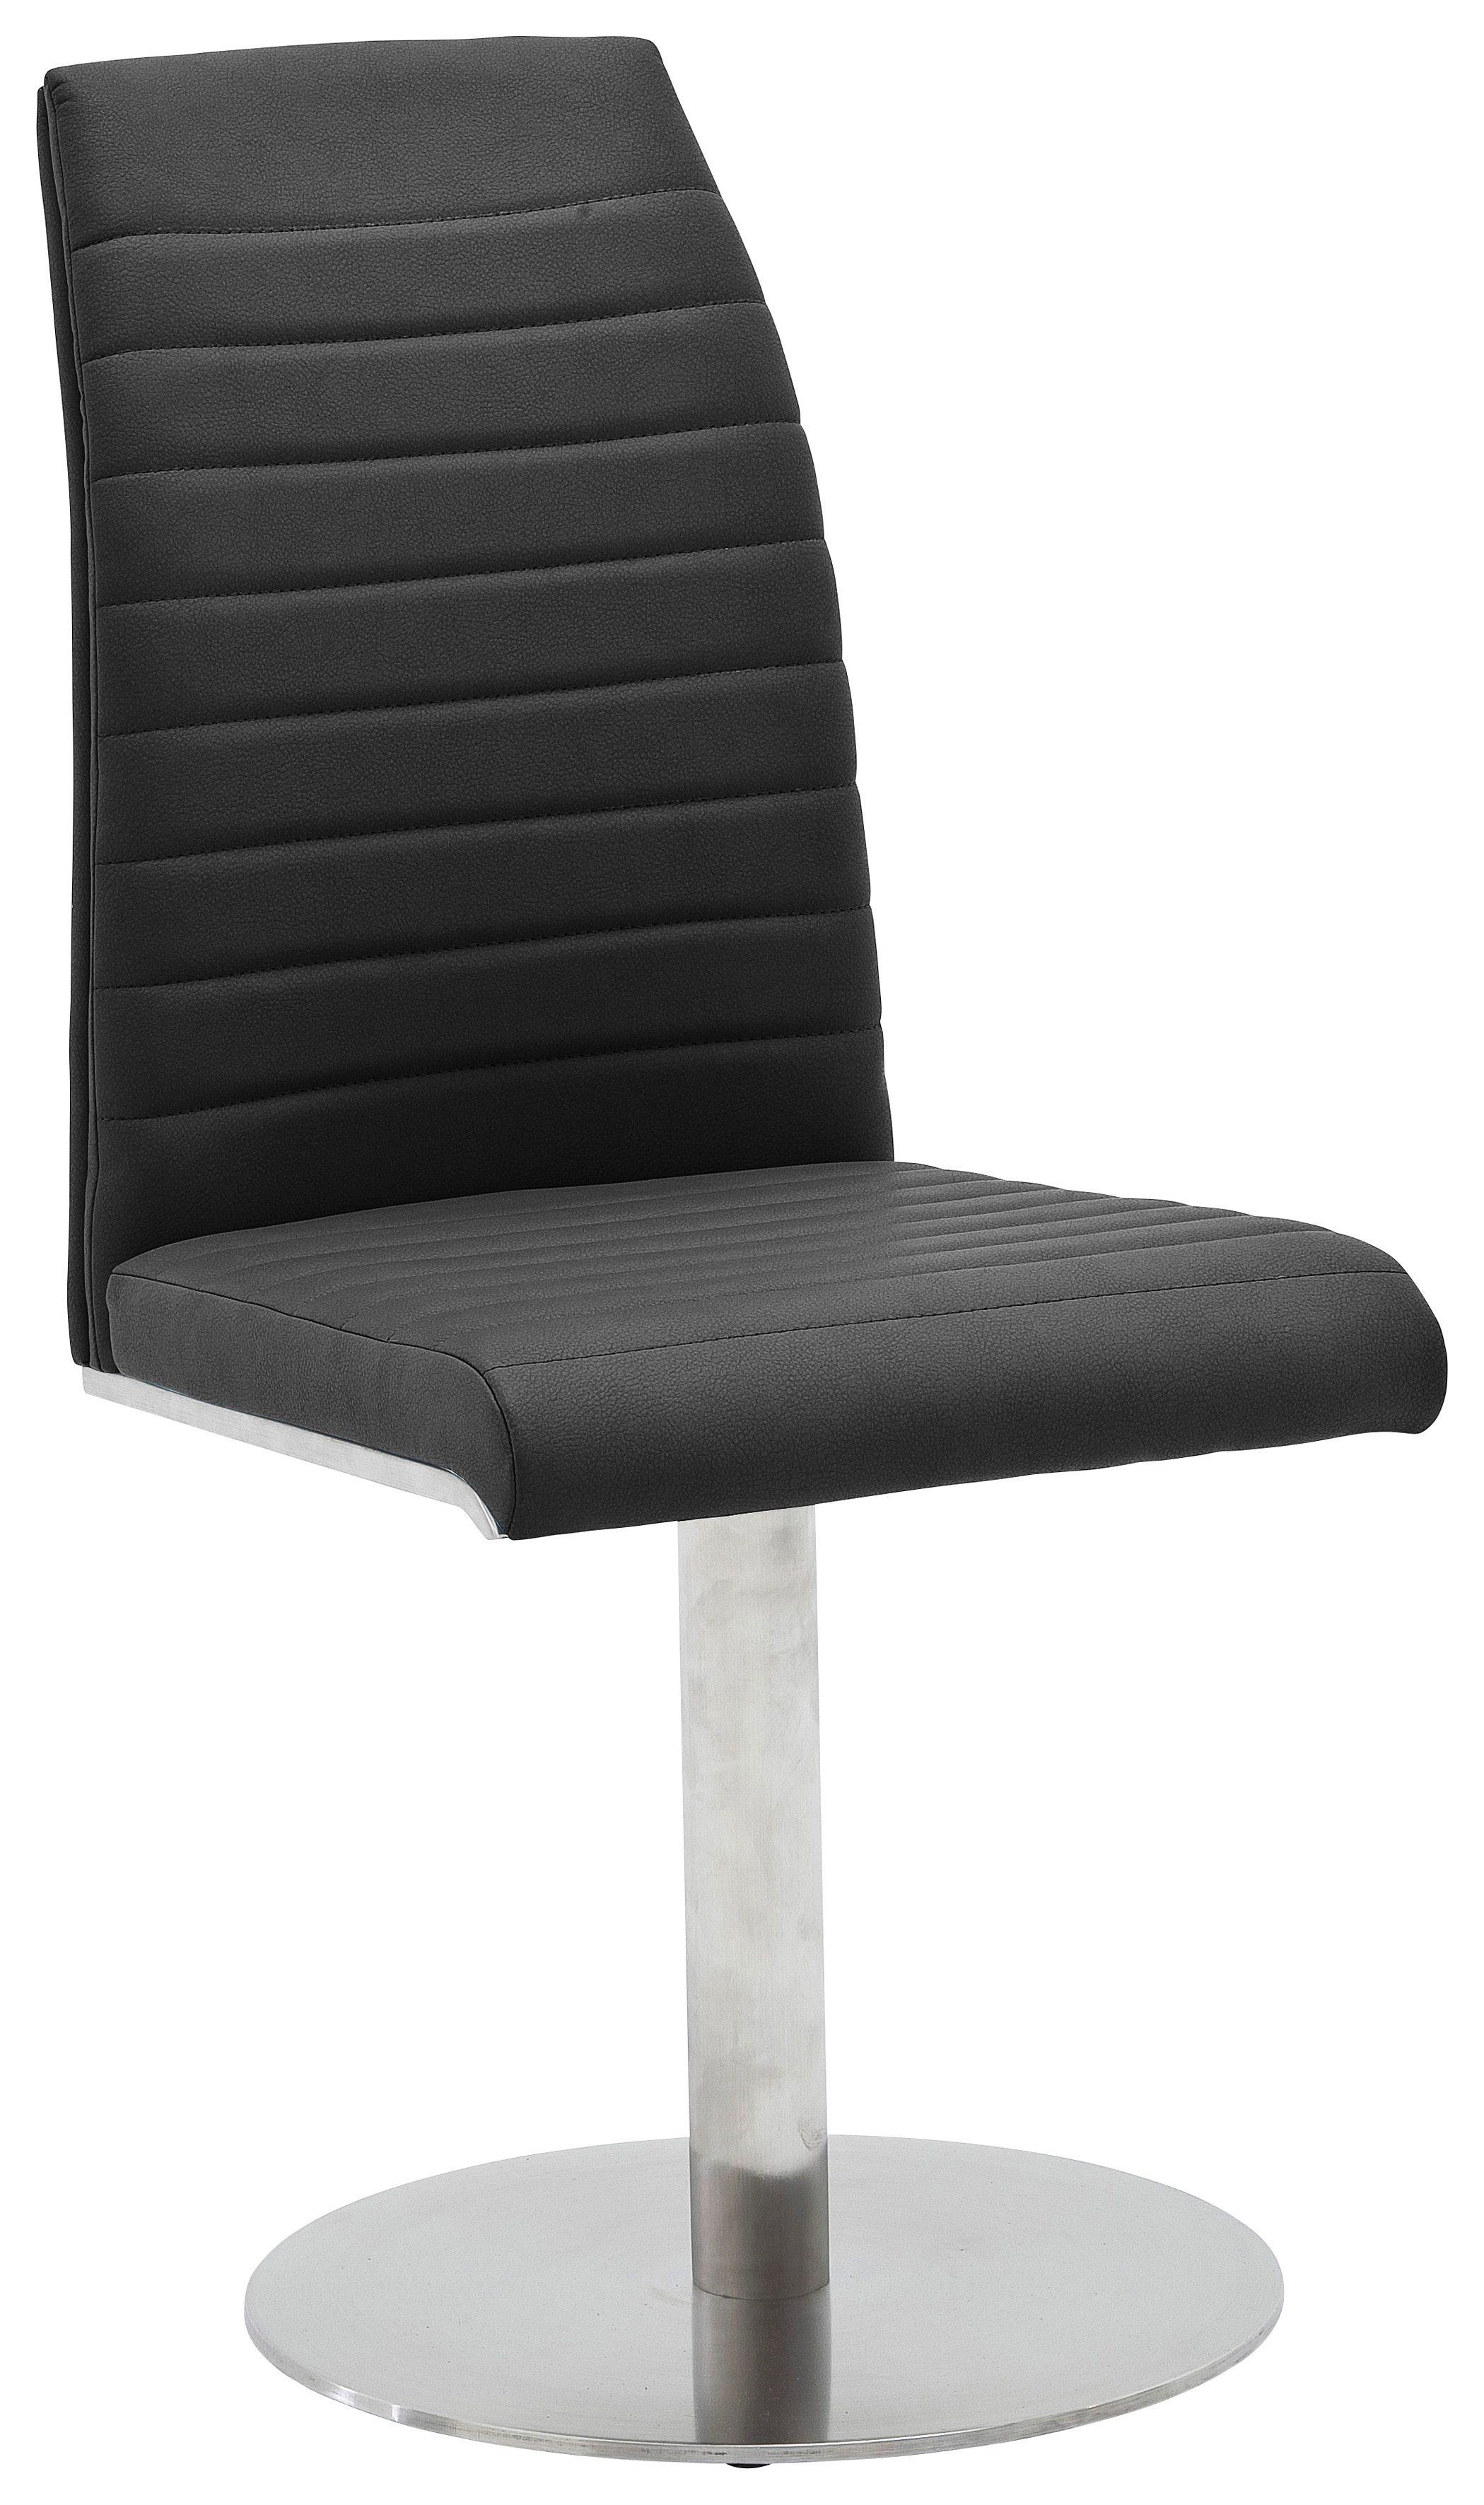 MCA furniture Drehstuhl »Flores A Tellerfuß« 2er Set Stuhl drehbar 360° max. 130 Kg belastbar online kaufen | OTTO